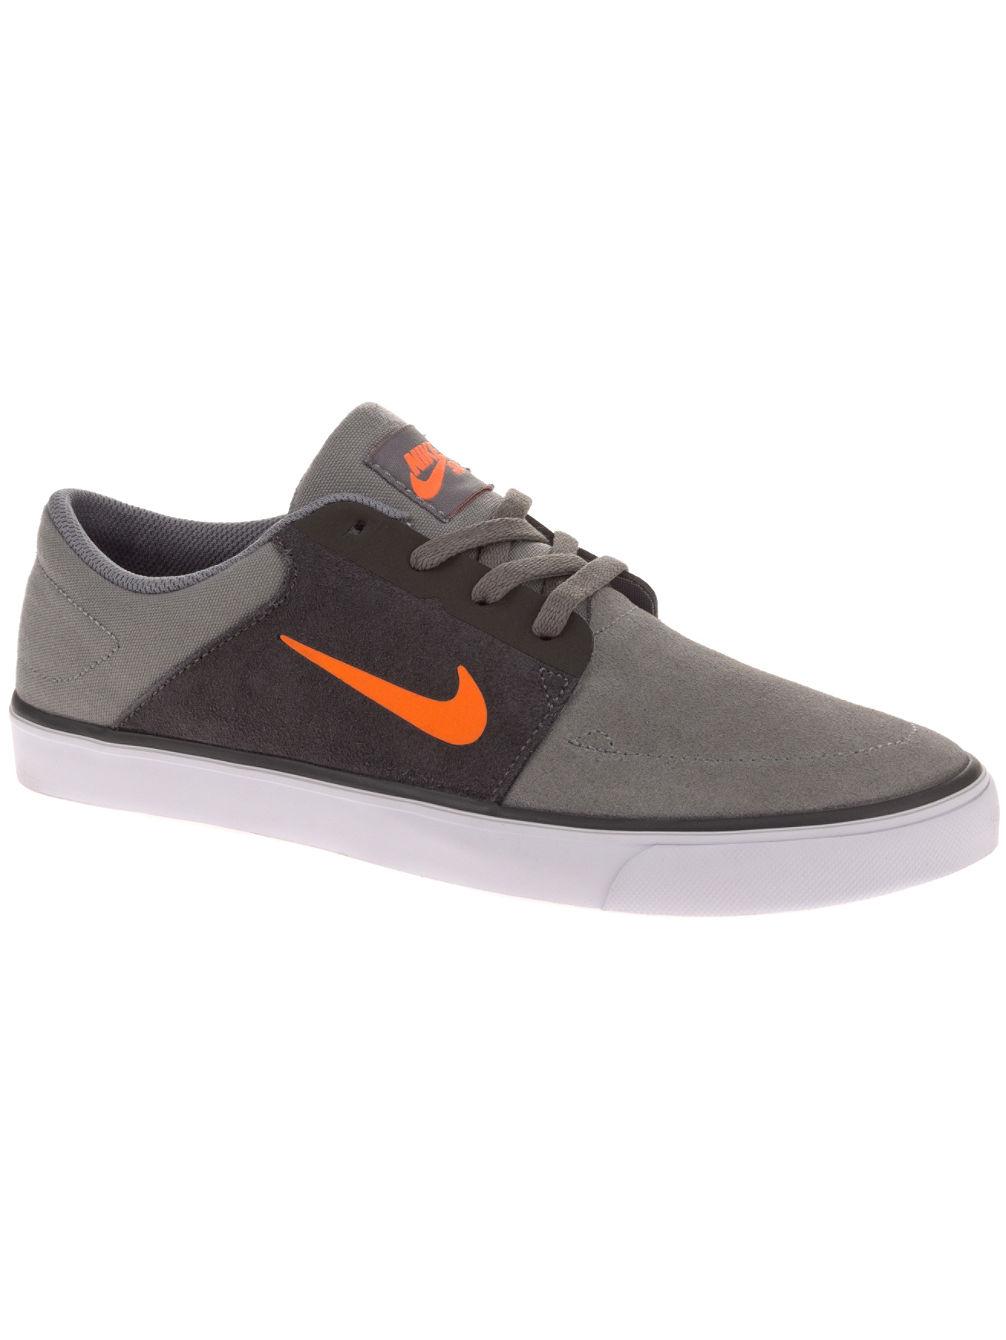 Nike SB Portmore (GS) Skate Shoes Boys - nike - blue-tomato.com